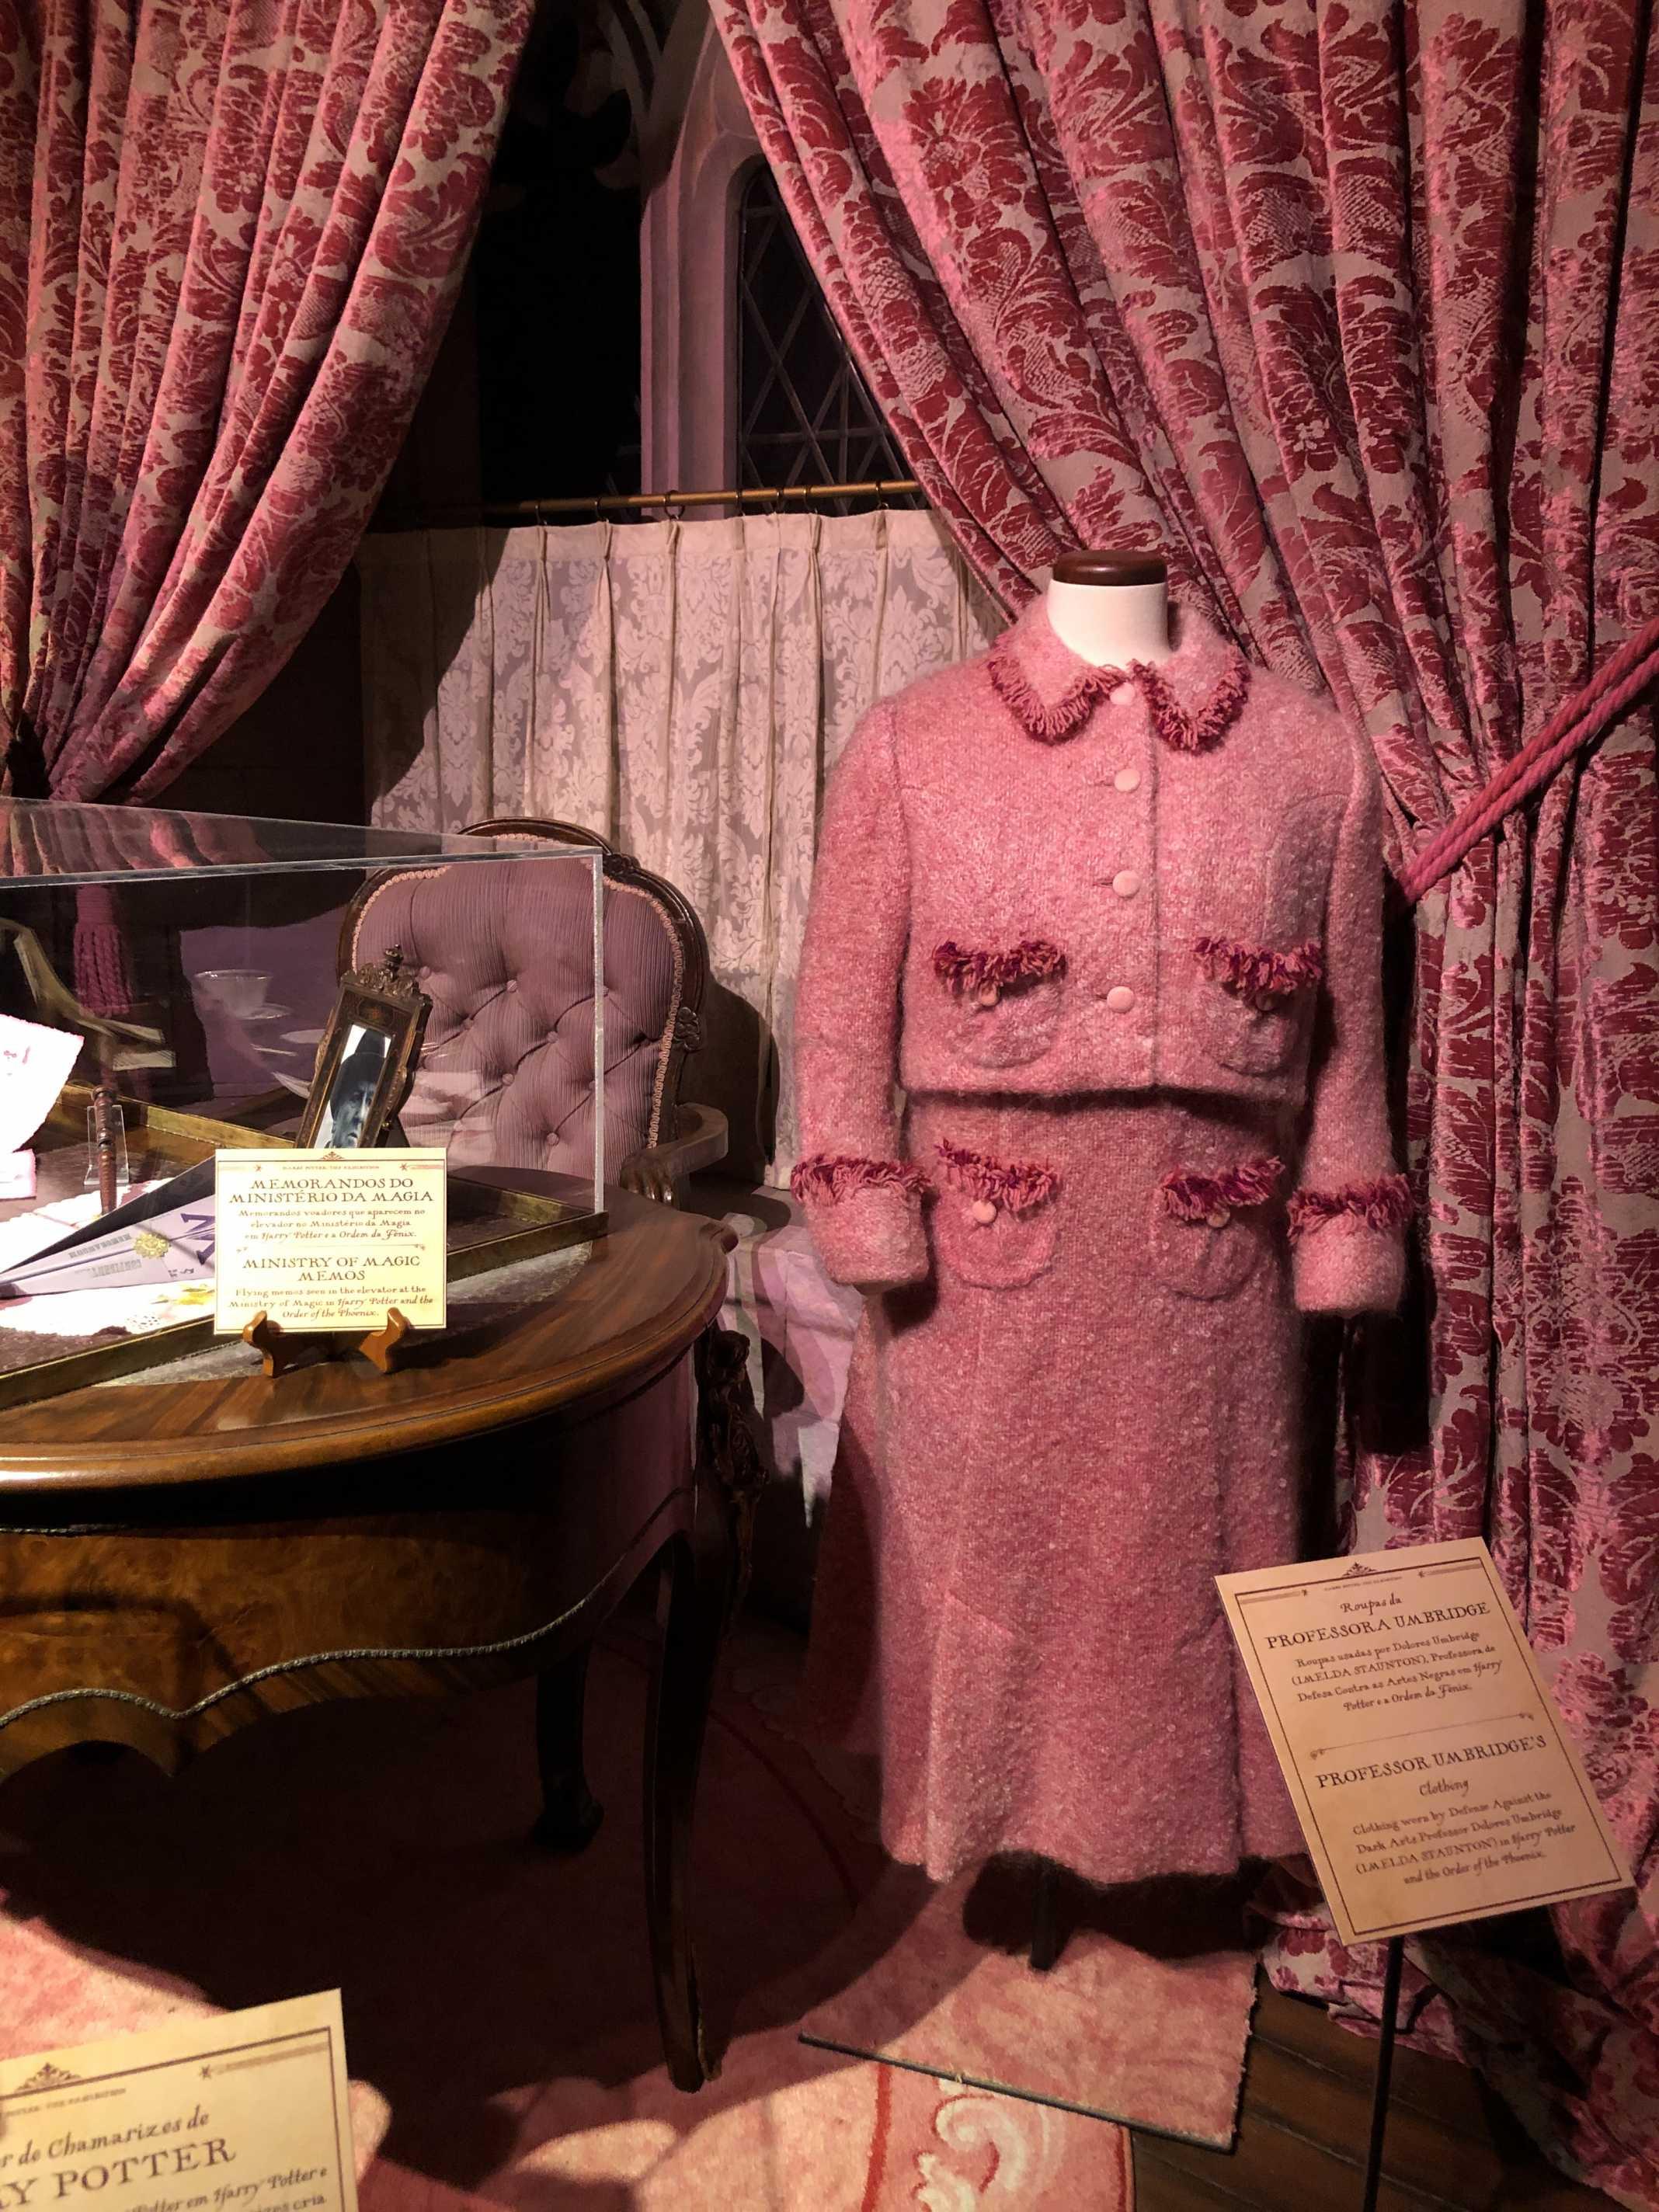 Umbridge Harry Potter Exposição